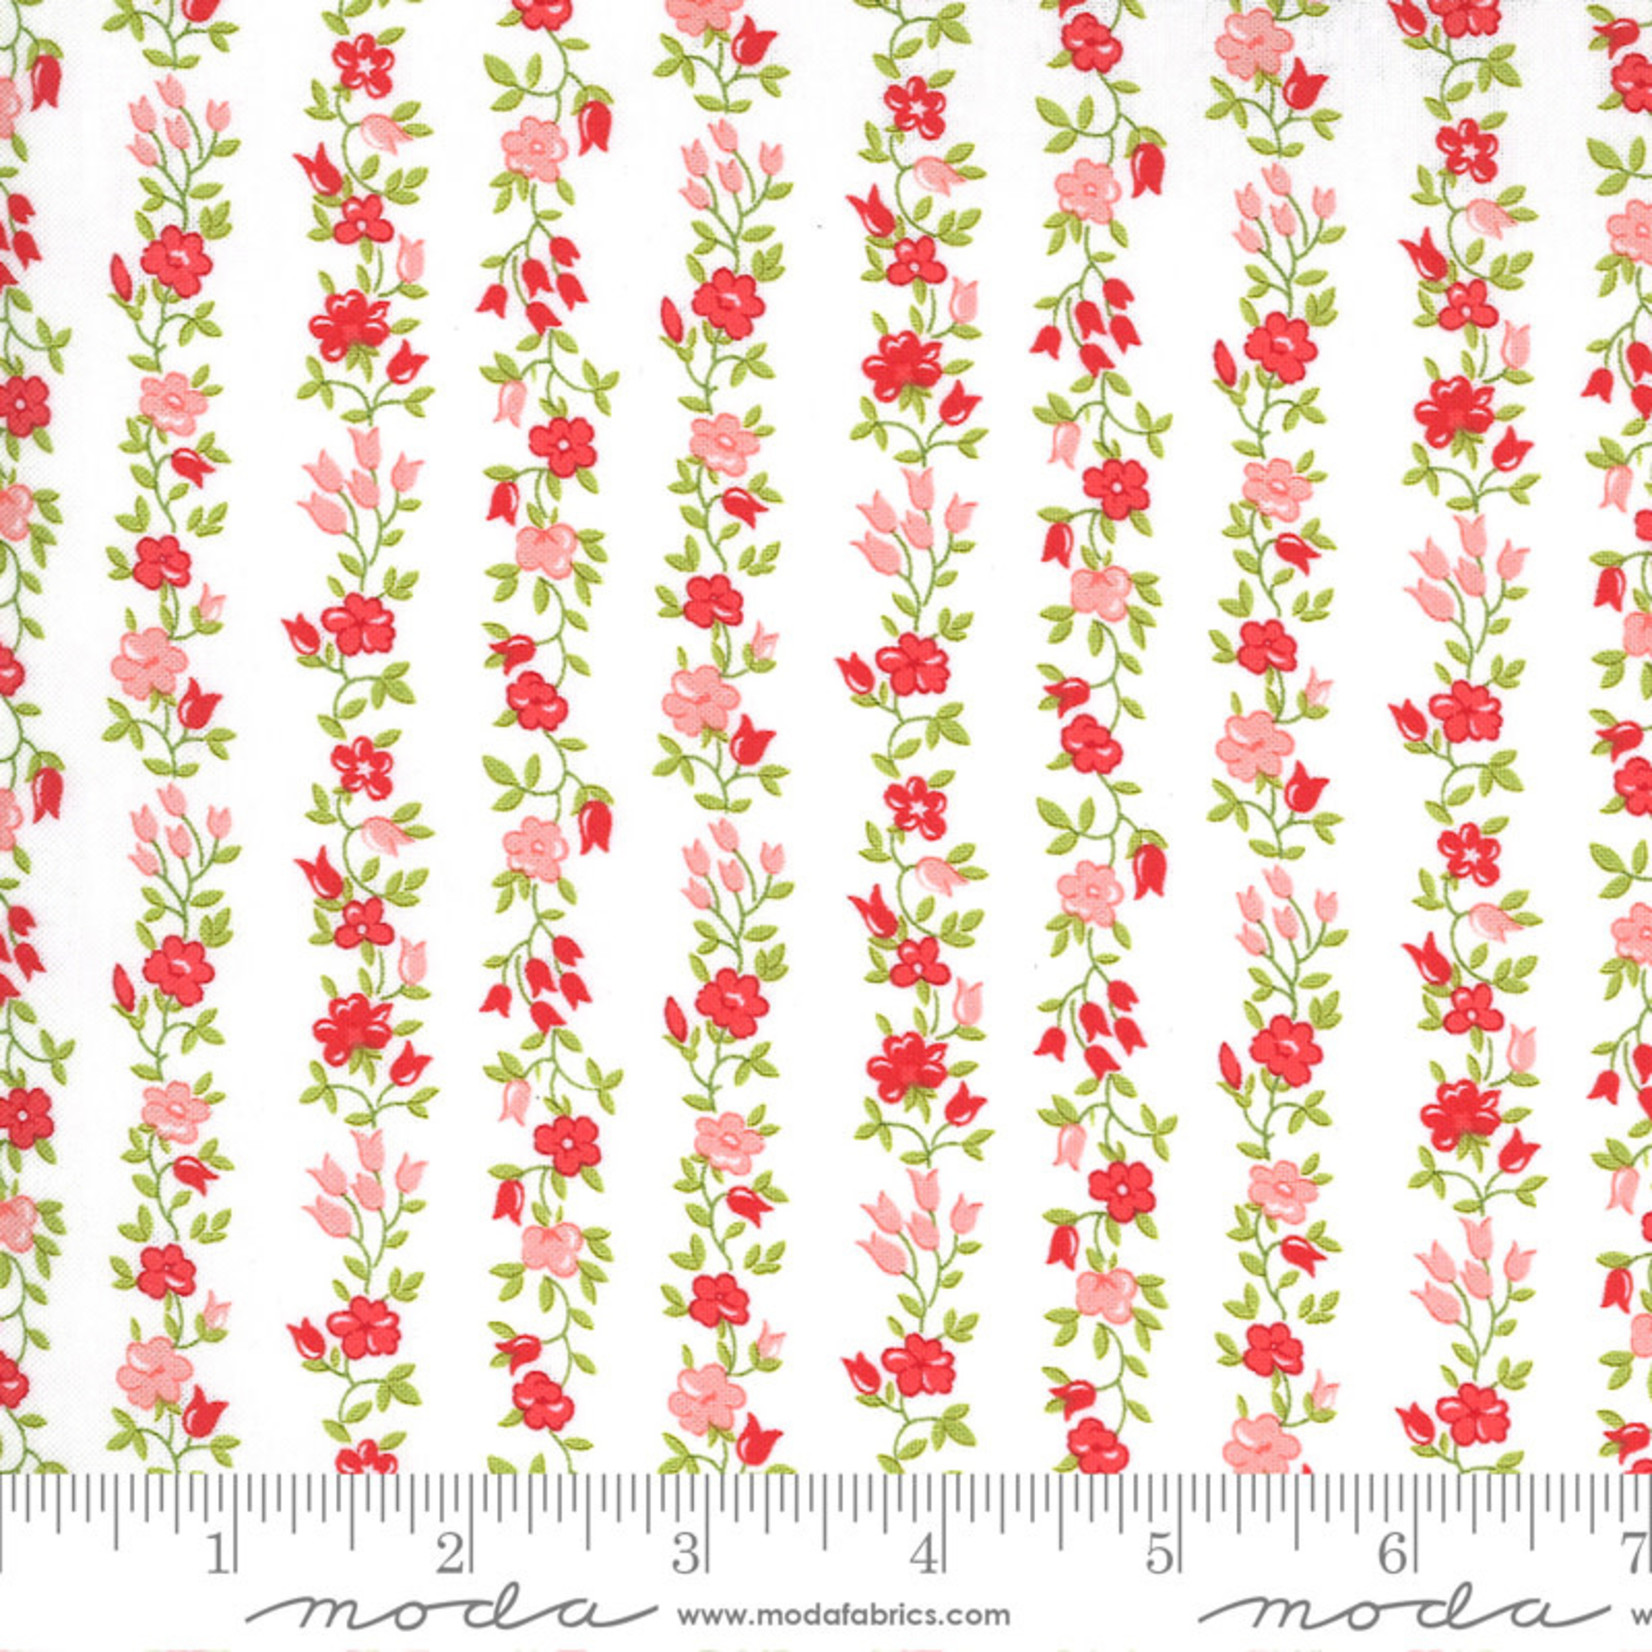 Bonnie & Camille Sunday Stroll, Freshly Cut, White Red 55224 11 $0.20 per cm or $20/m